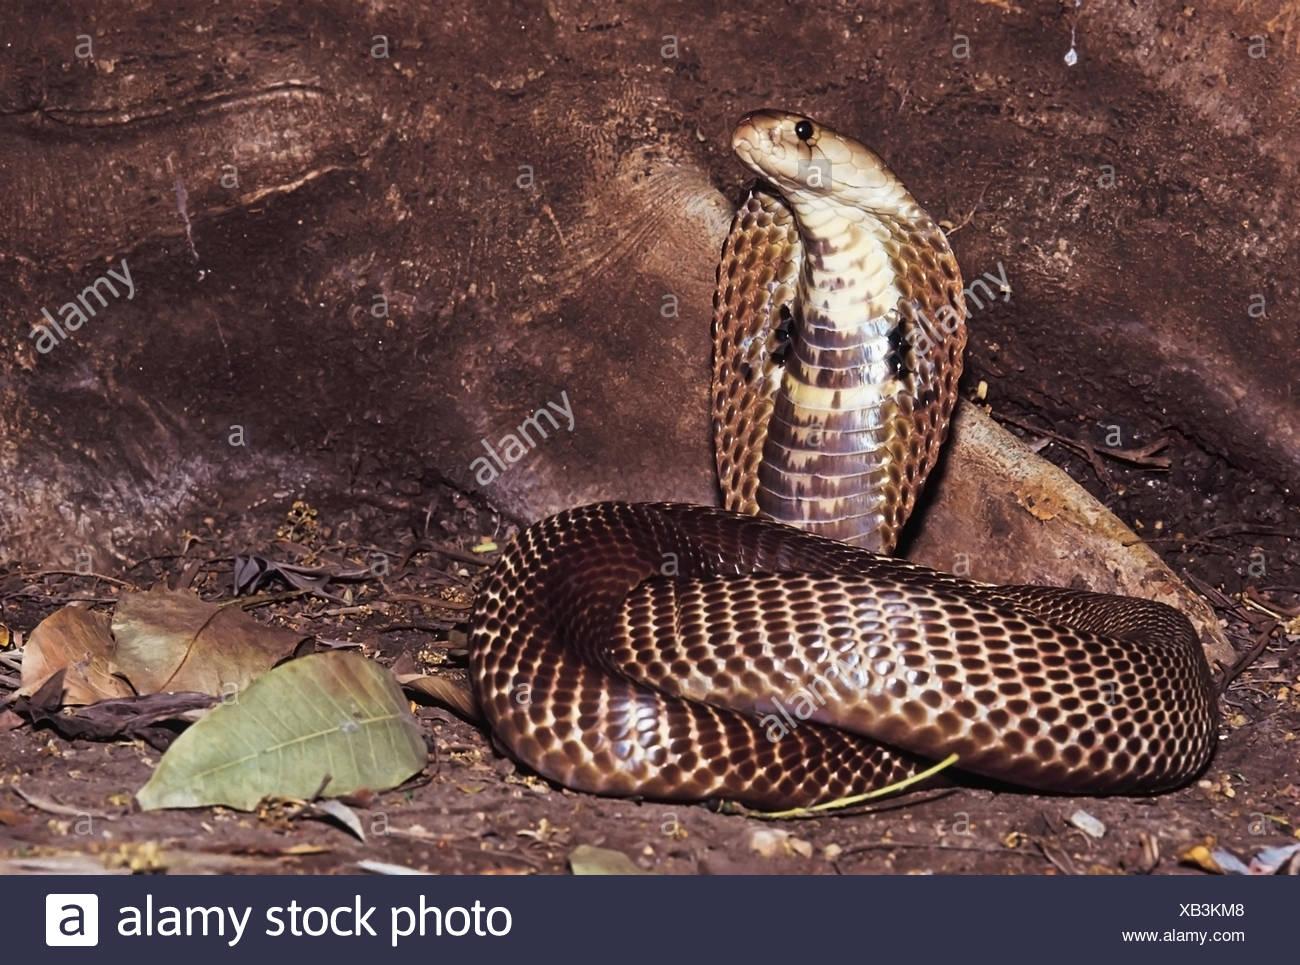 Naja Naja. Common/Spectacled Cobra displaying the classic 'snake charmer' defensive pose. Venomous. Nasrapur, Maharashtra, India. - Stock Image